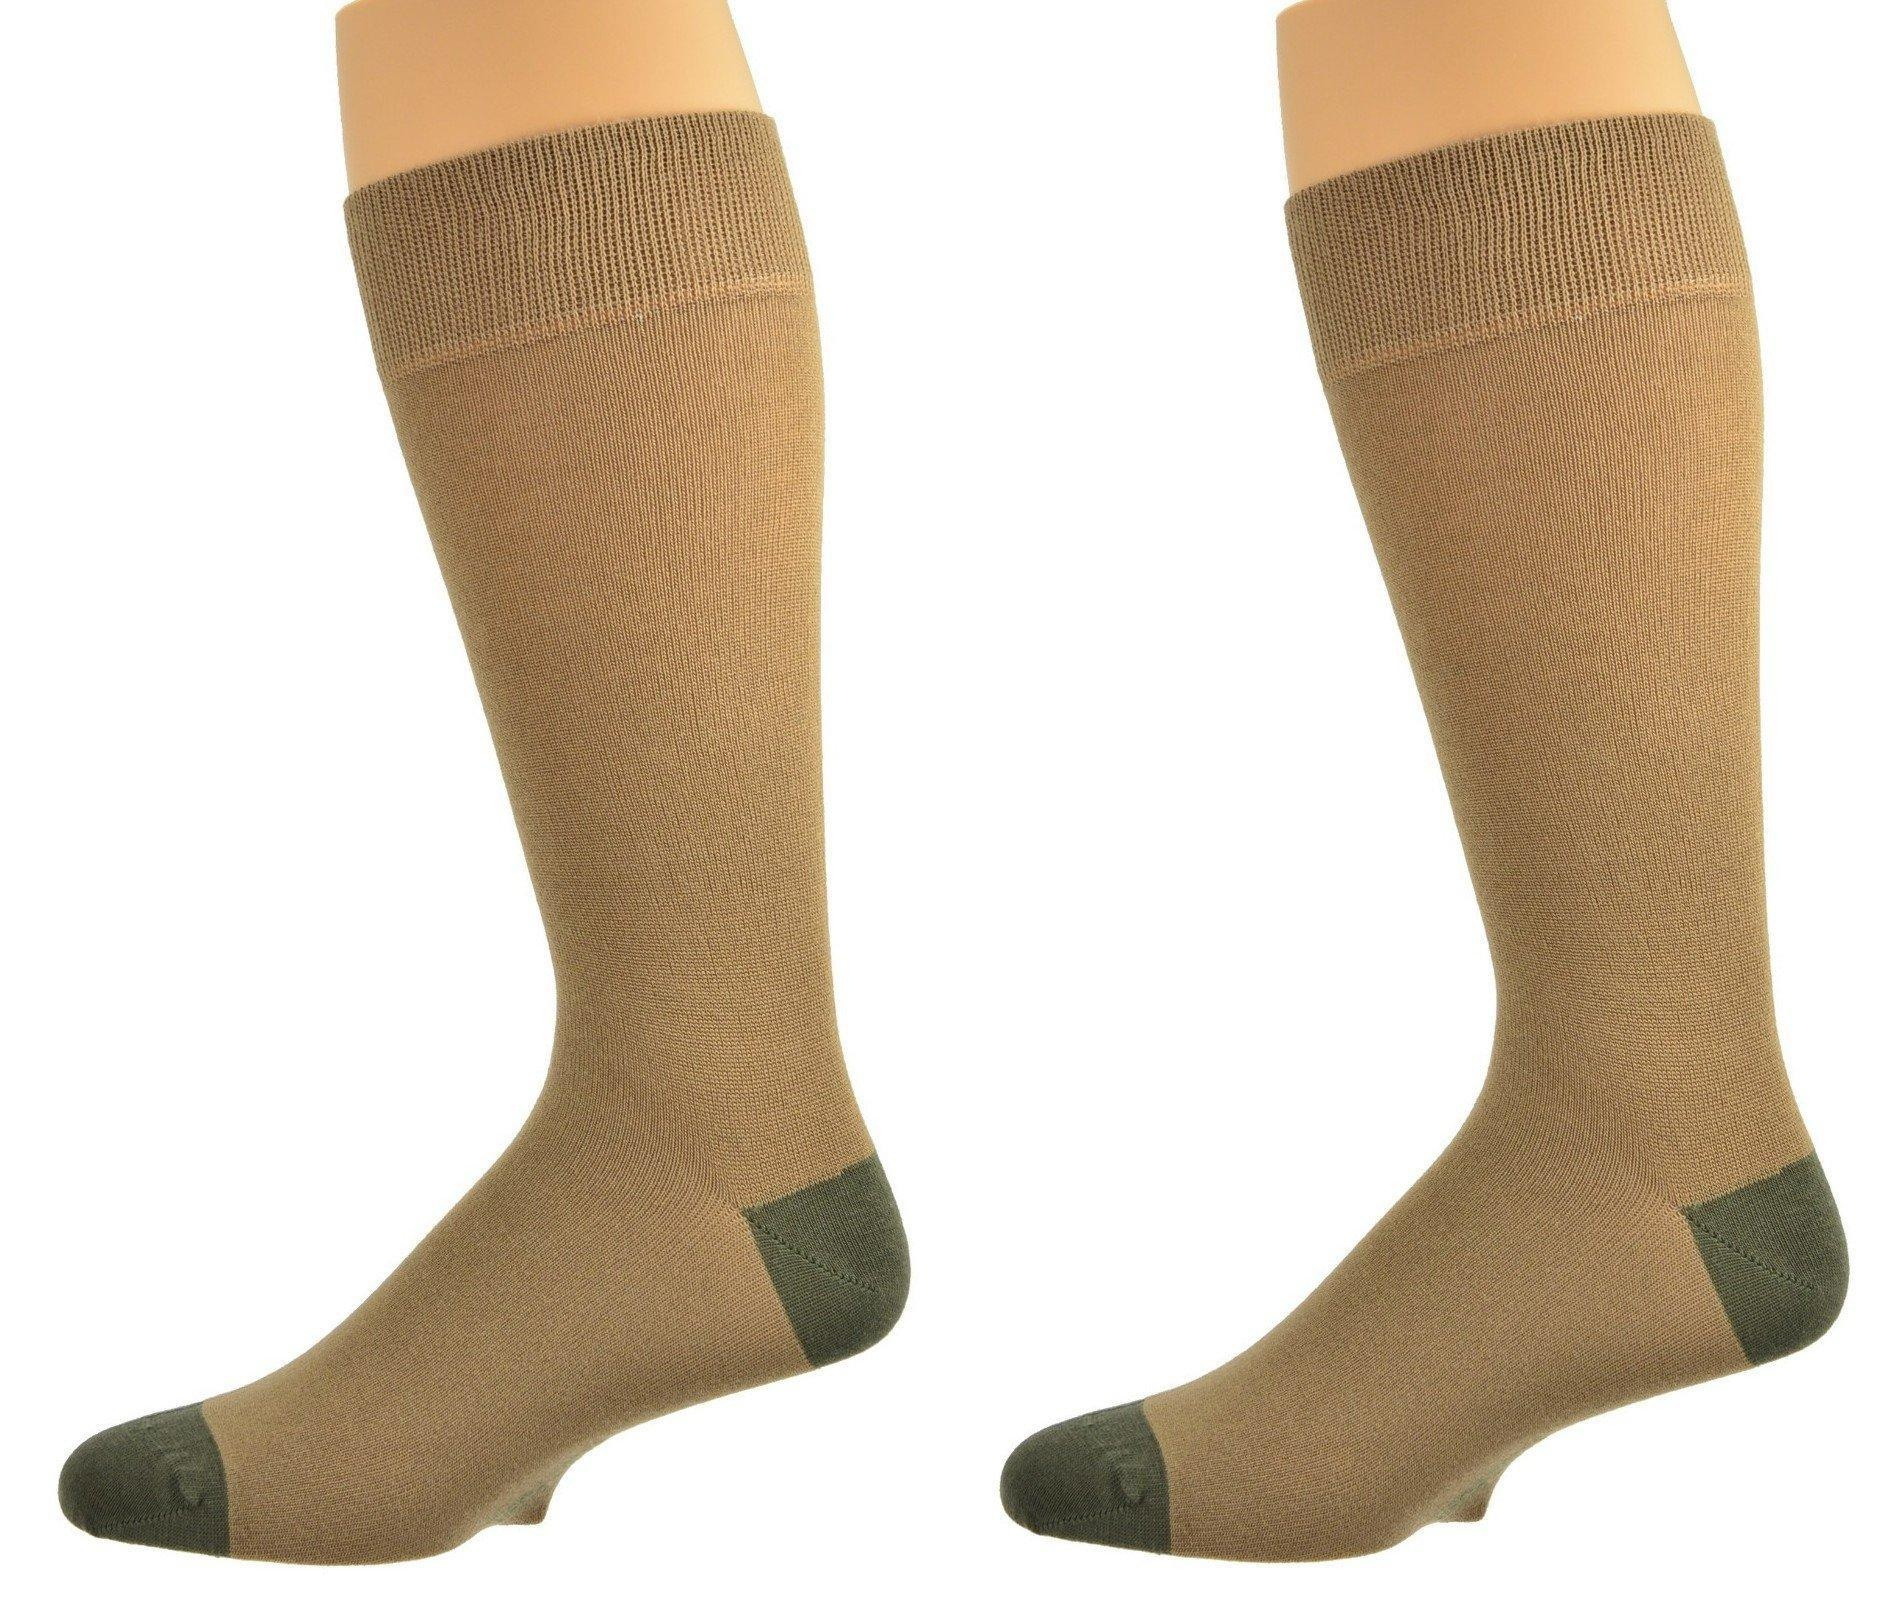 Sierra Socks Men's Contrast Heel & Toe Rayon From Bamboo (10-13, Tan 2 Pair)